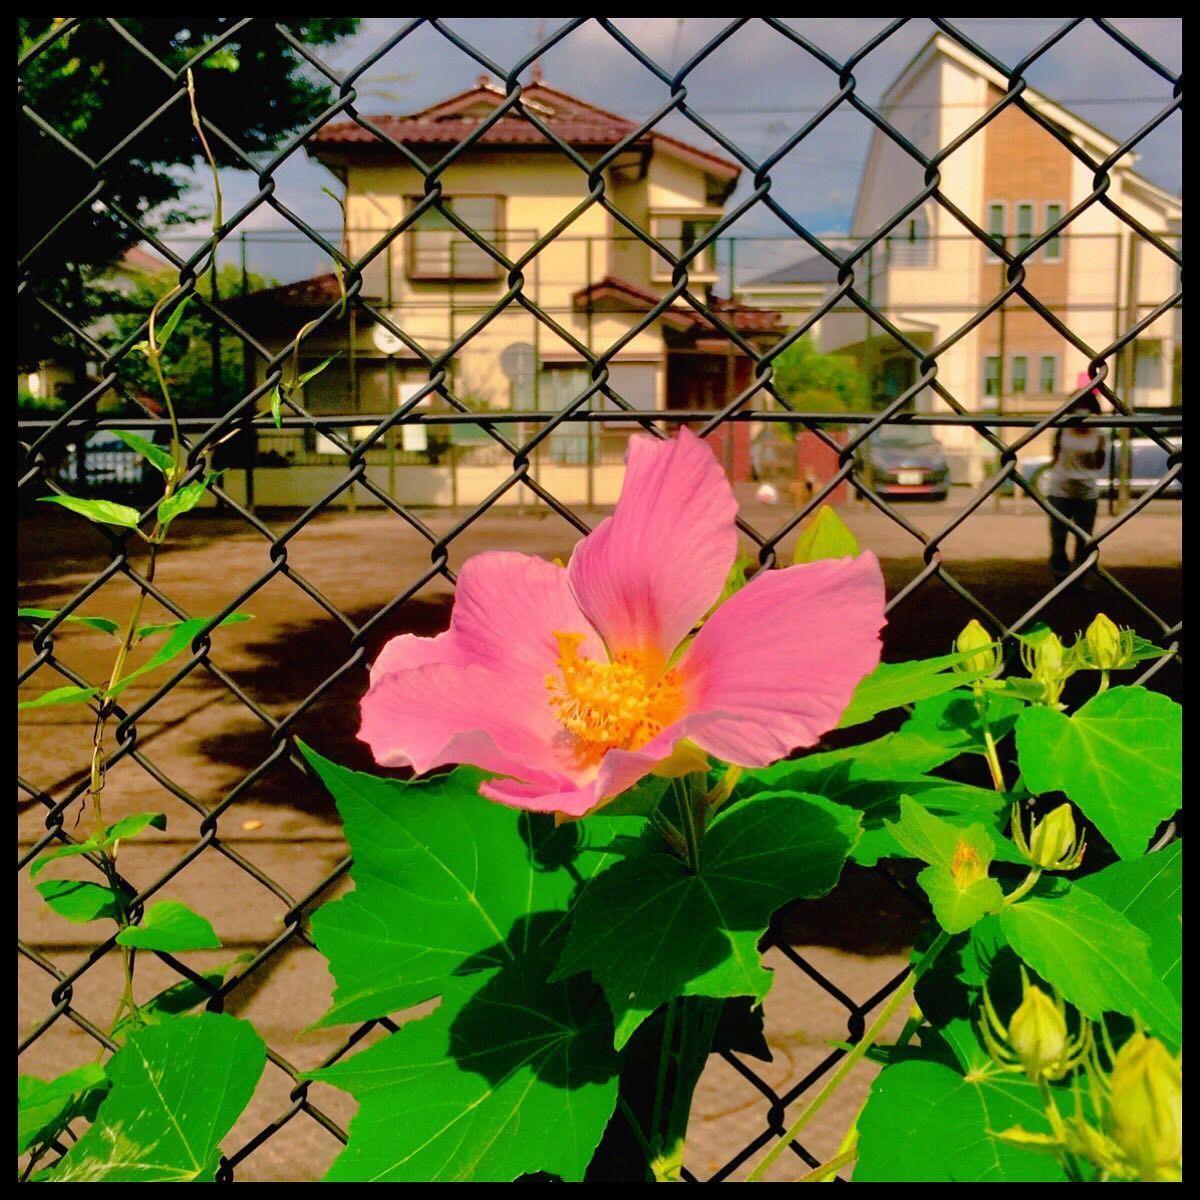 7月28日(水)芙蓉の花が咲く季節 - 毎日jogjob日誌 by東良美季